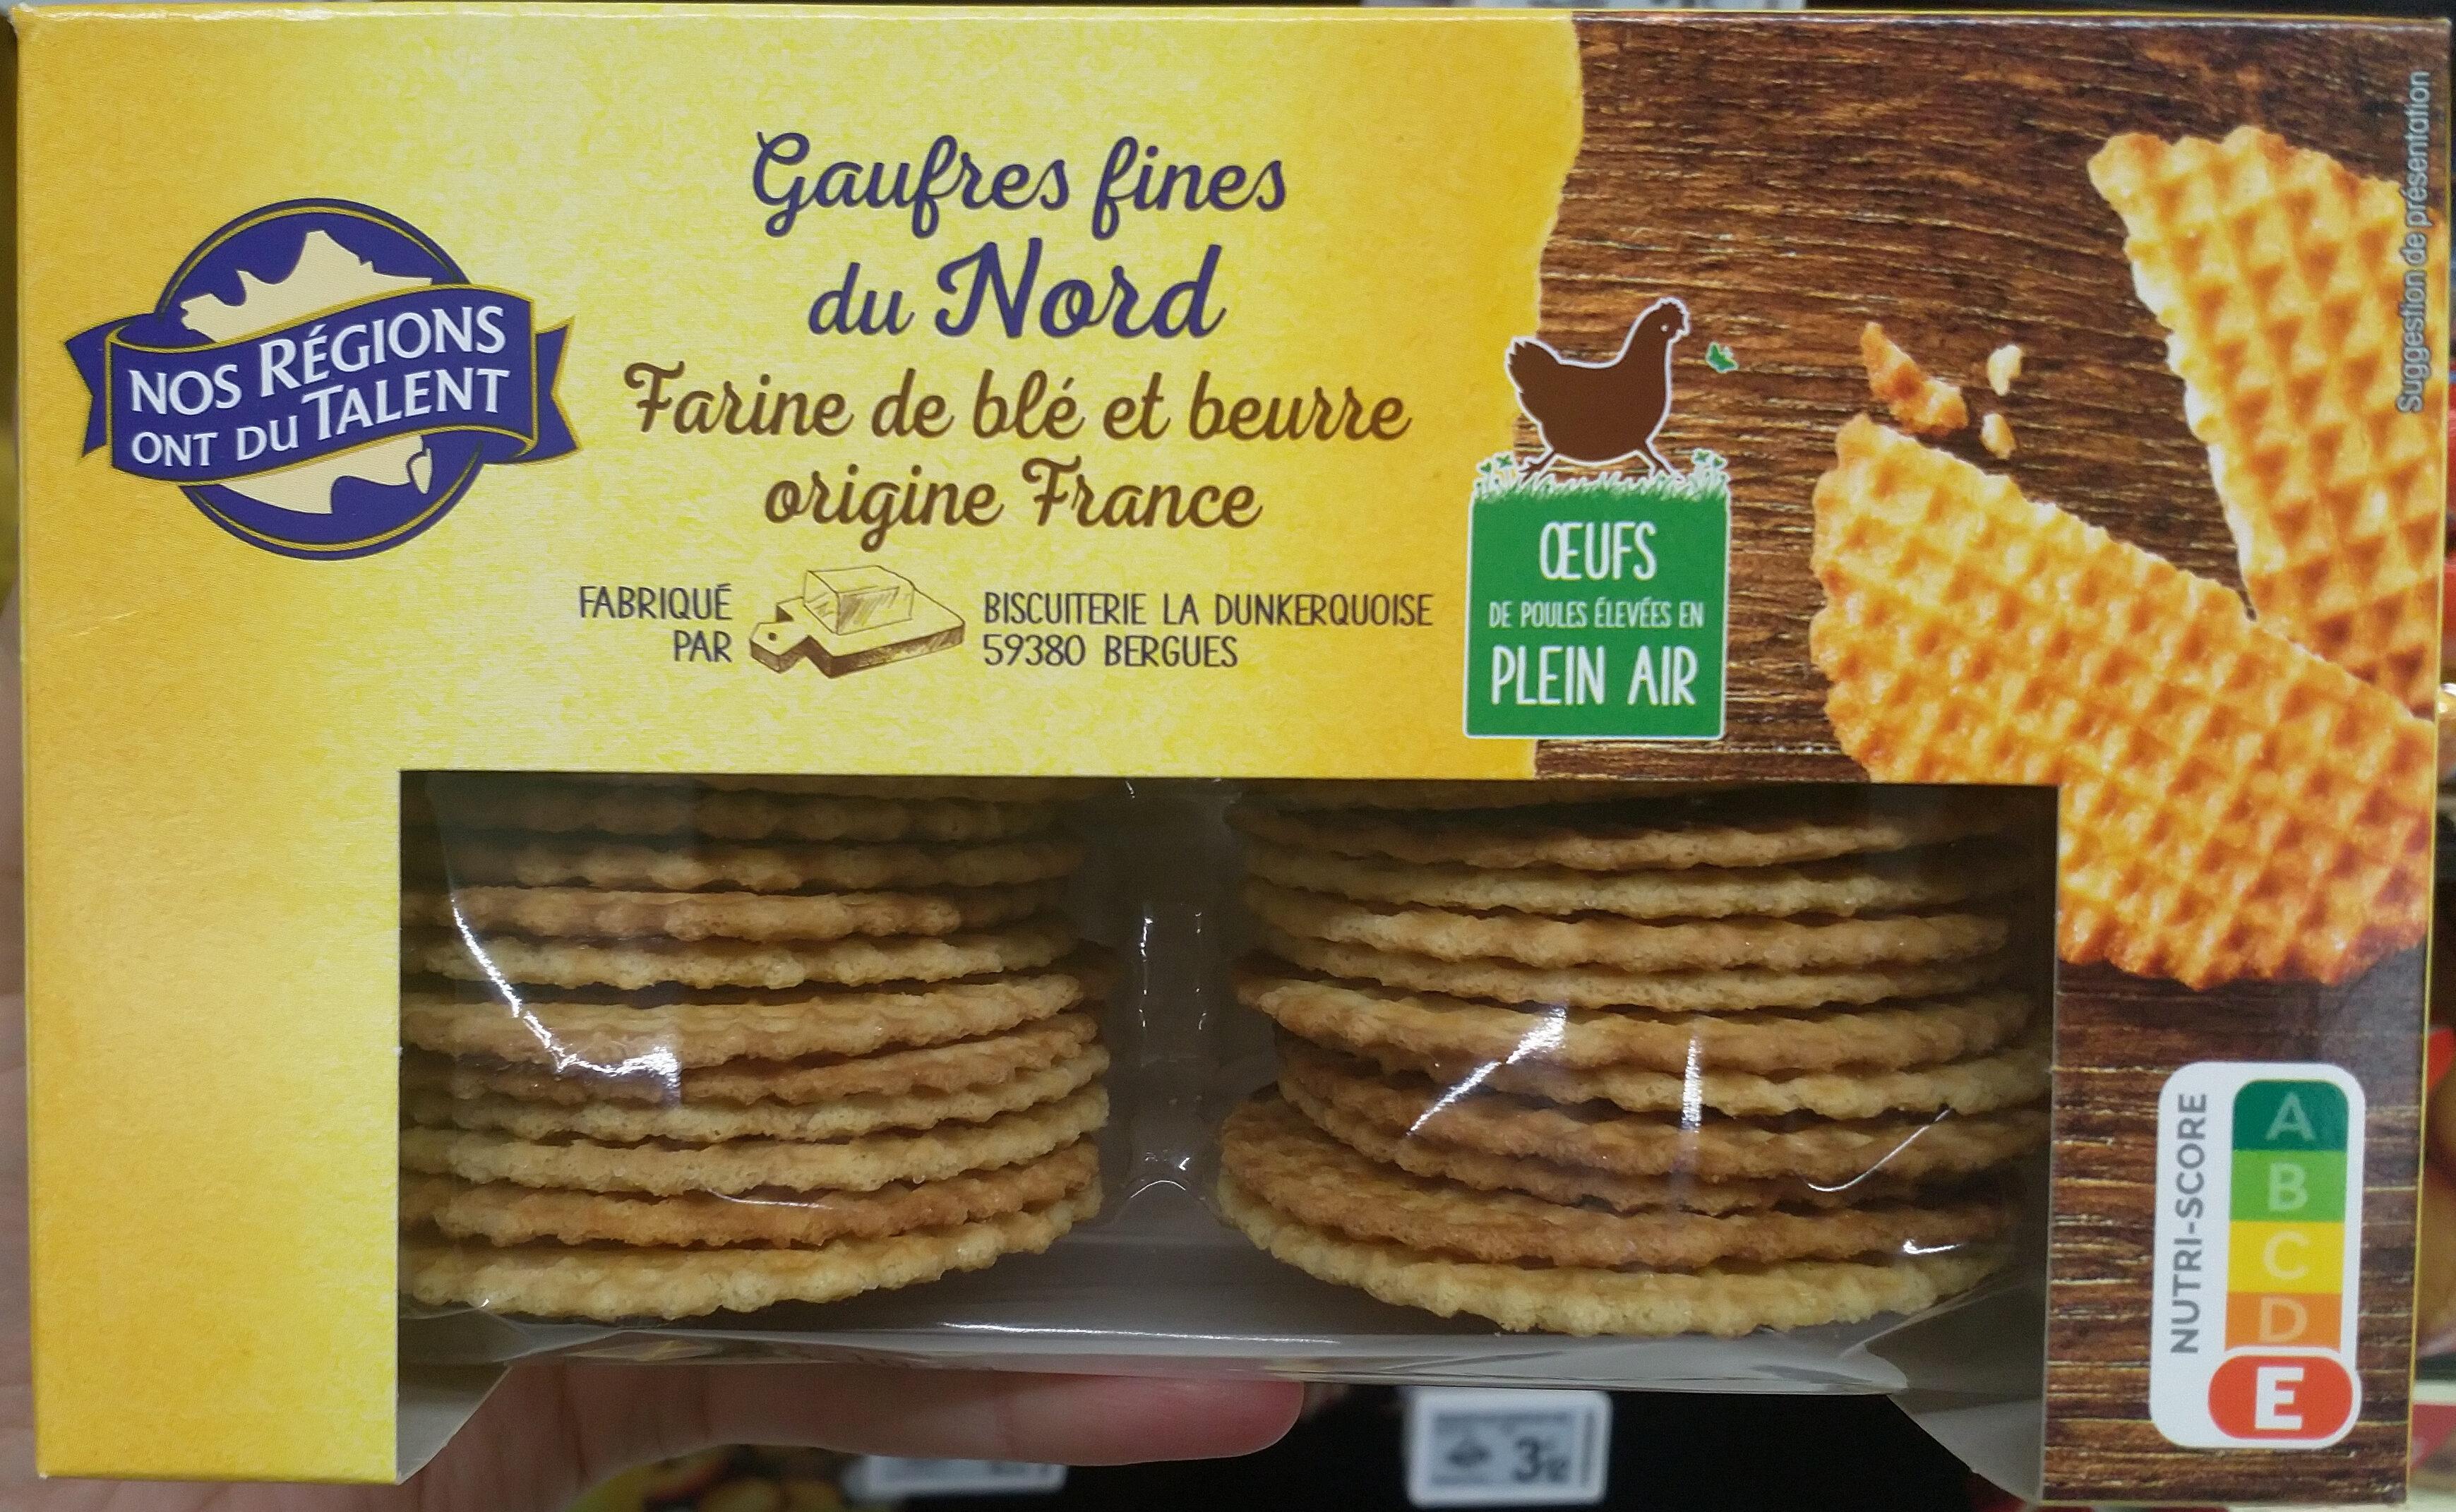 Gaufres fines du Nord pur beurre - Product - fr